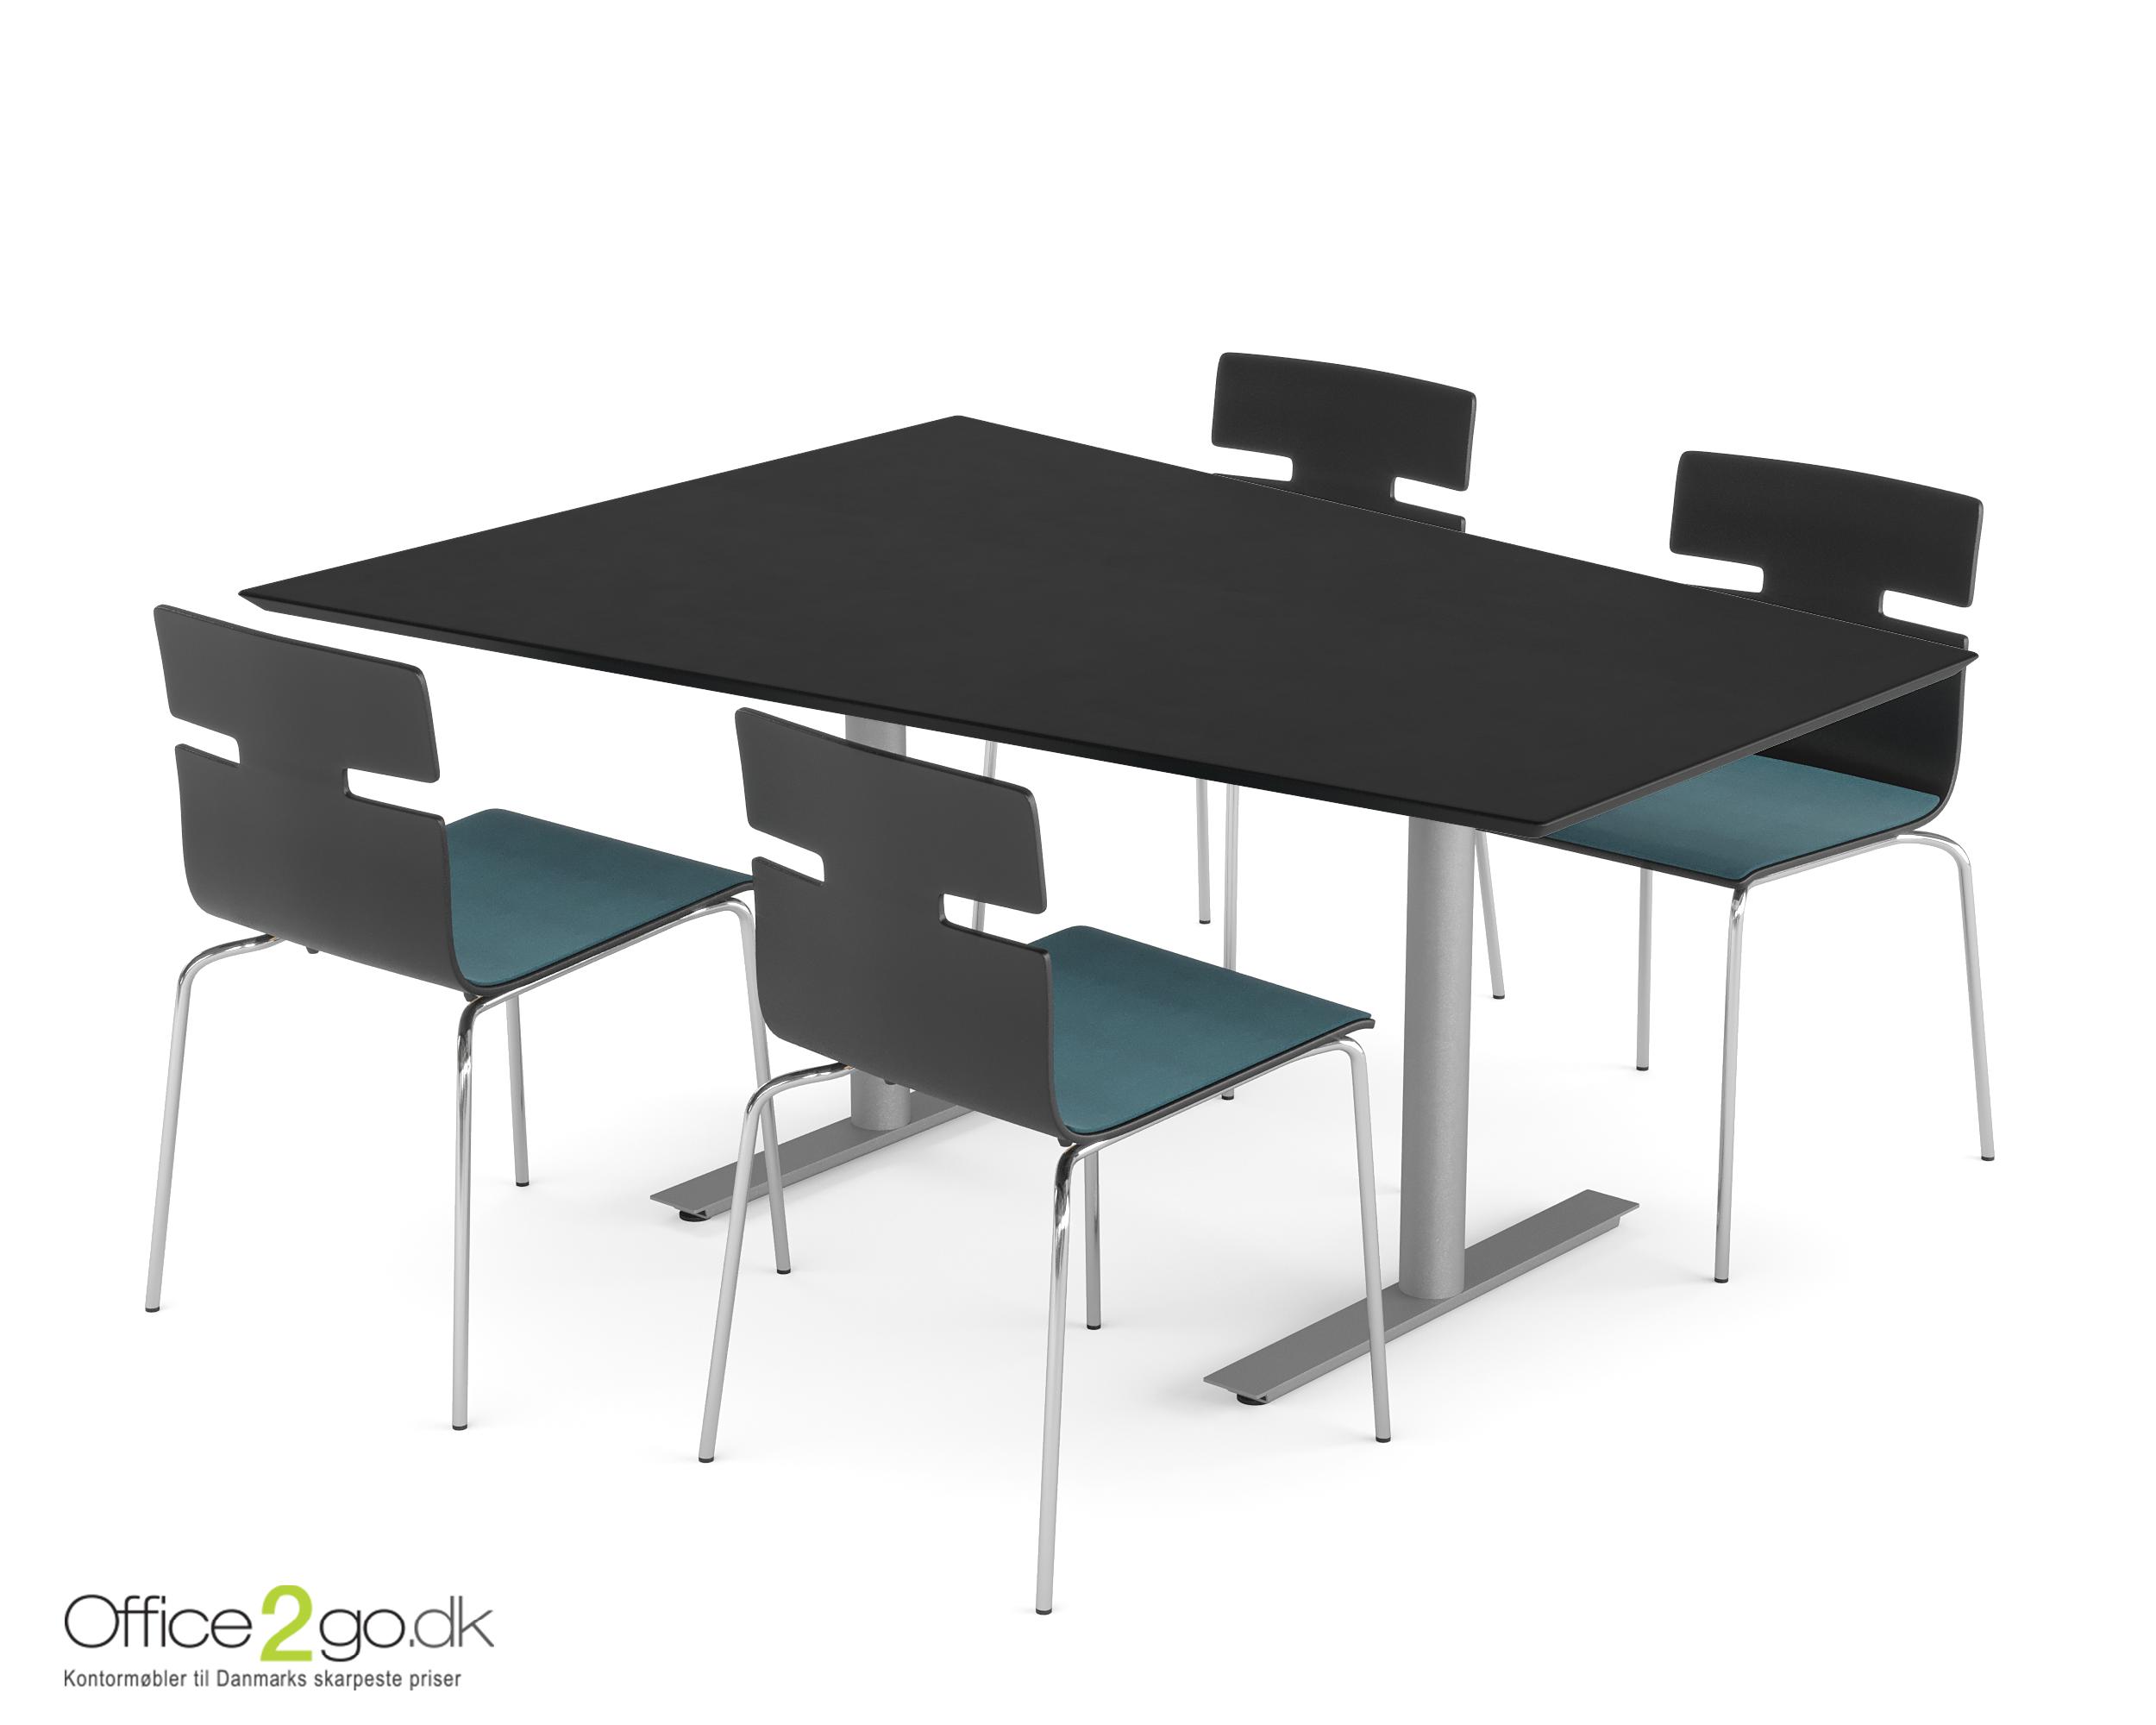 Inline Media mødebord - 4 personer - 160 cm.